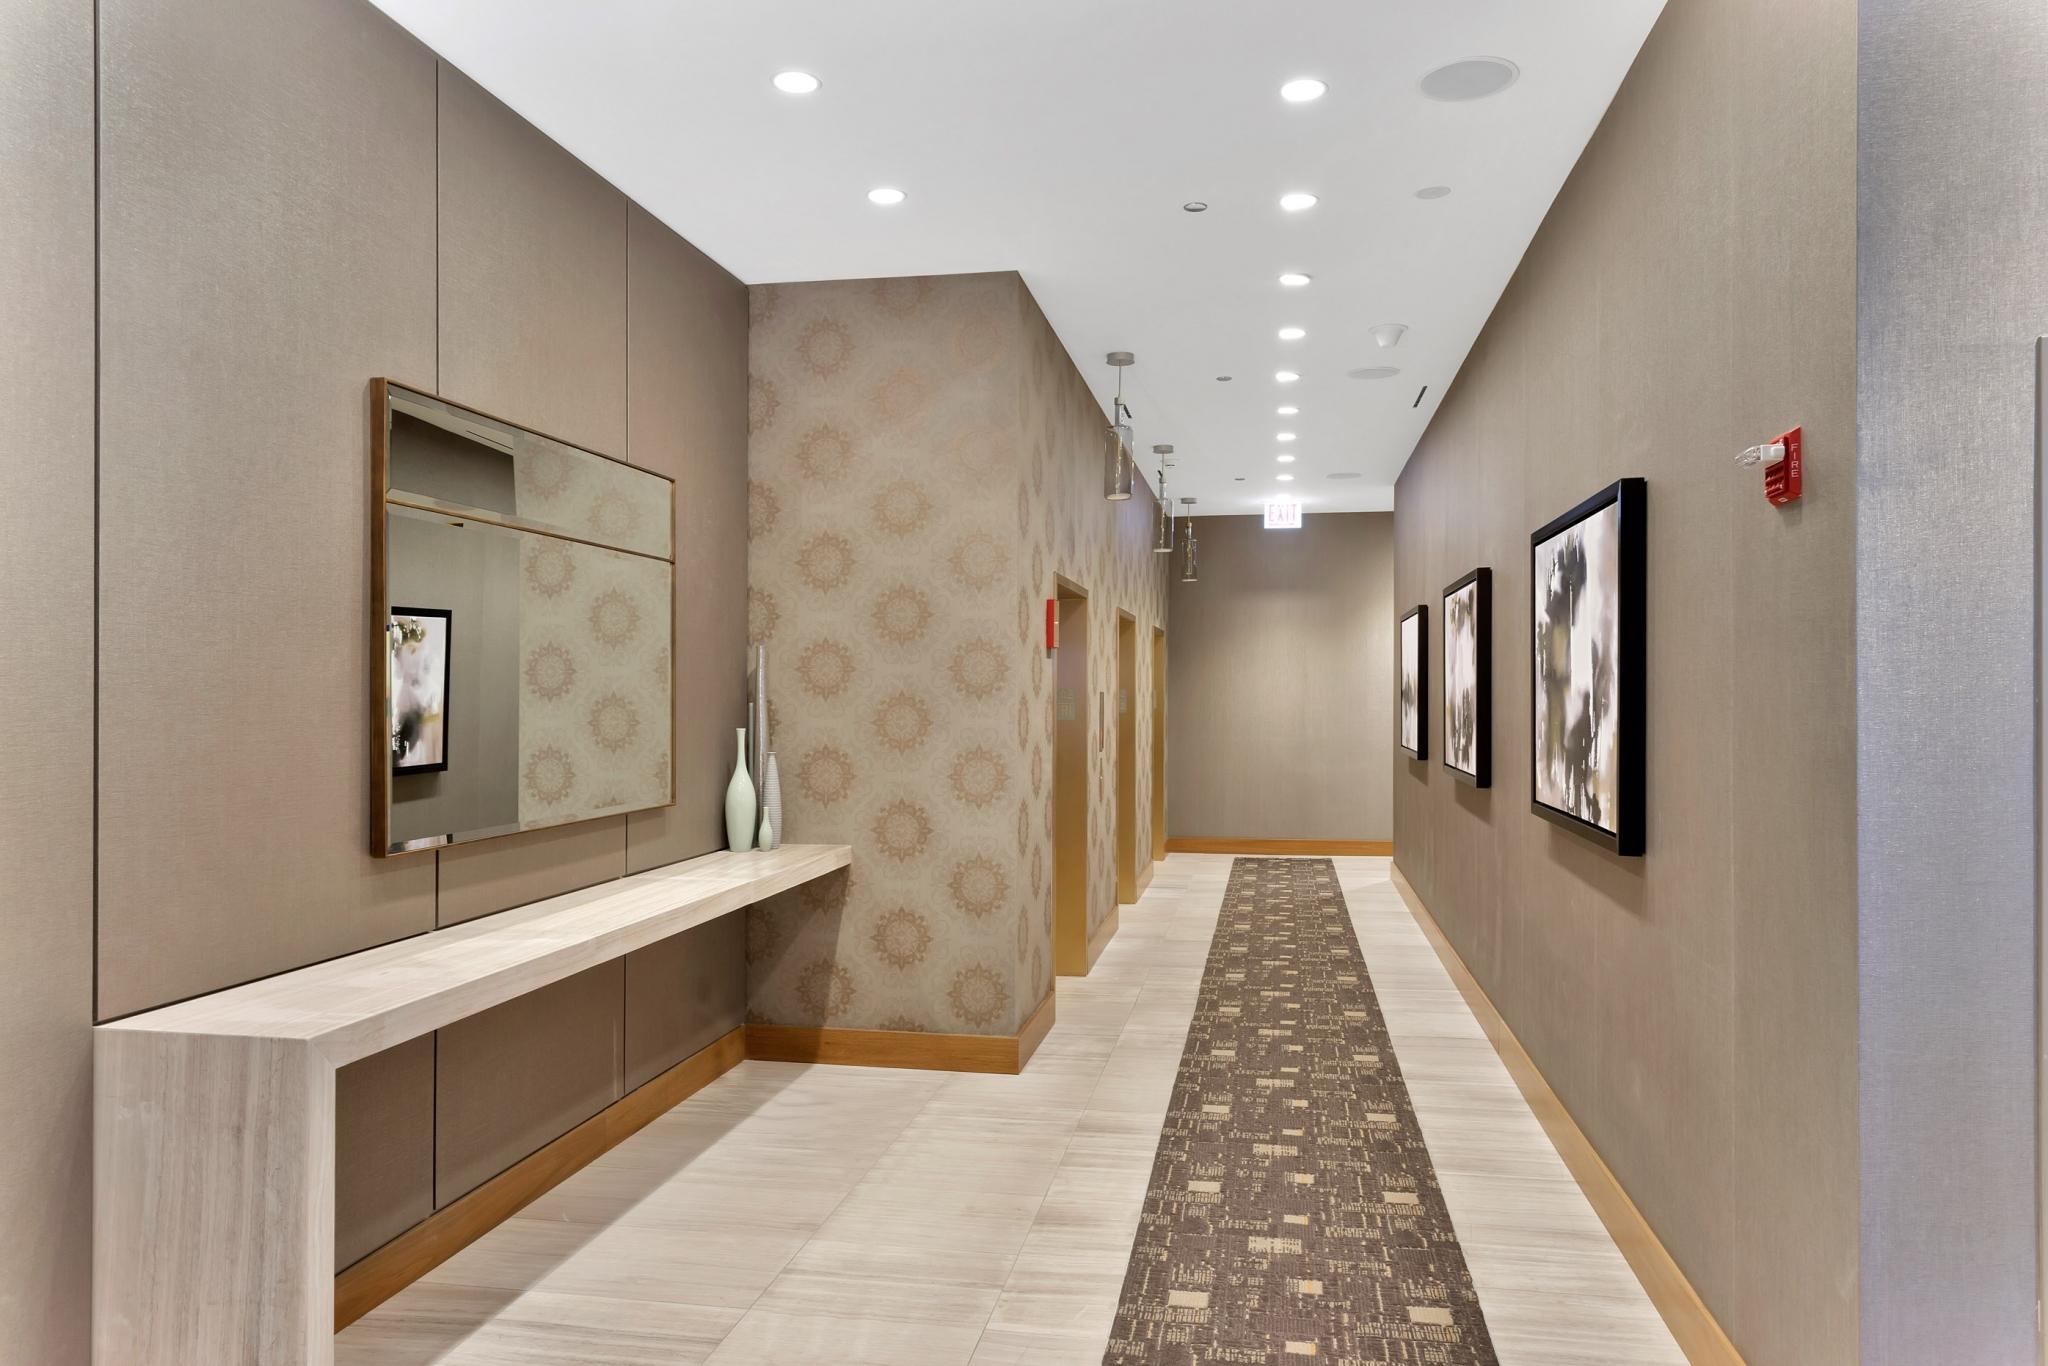 Loews - Hallway.jpg